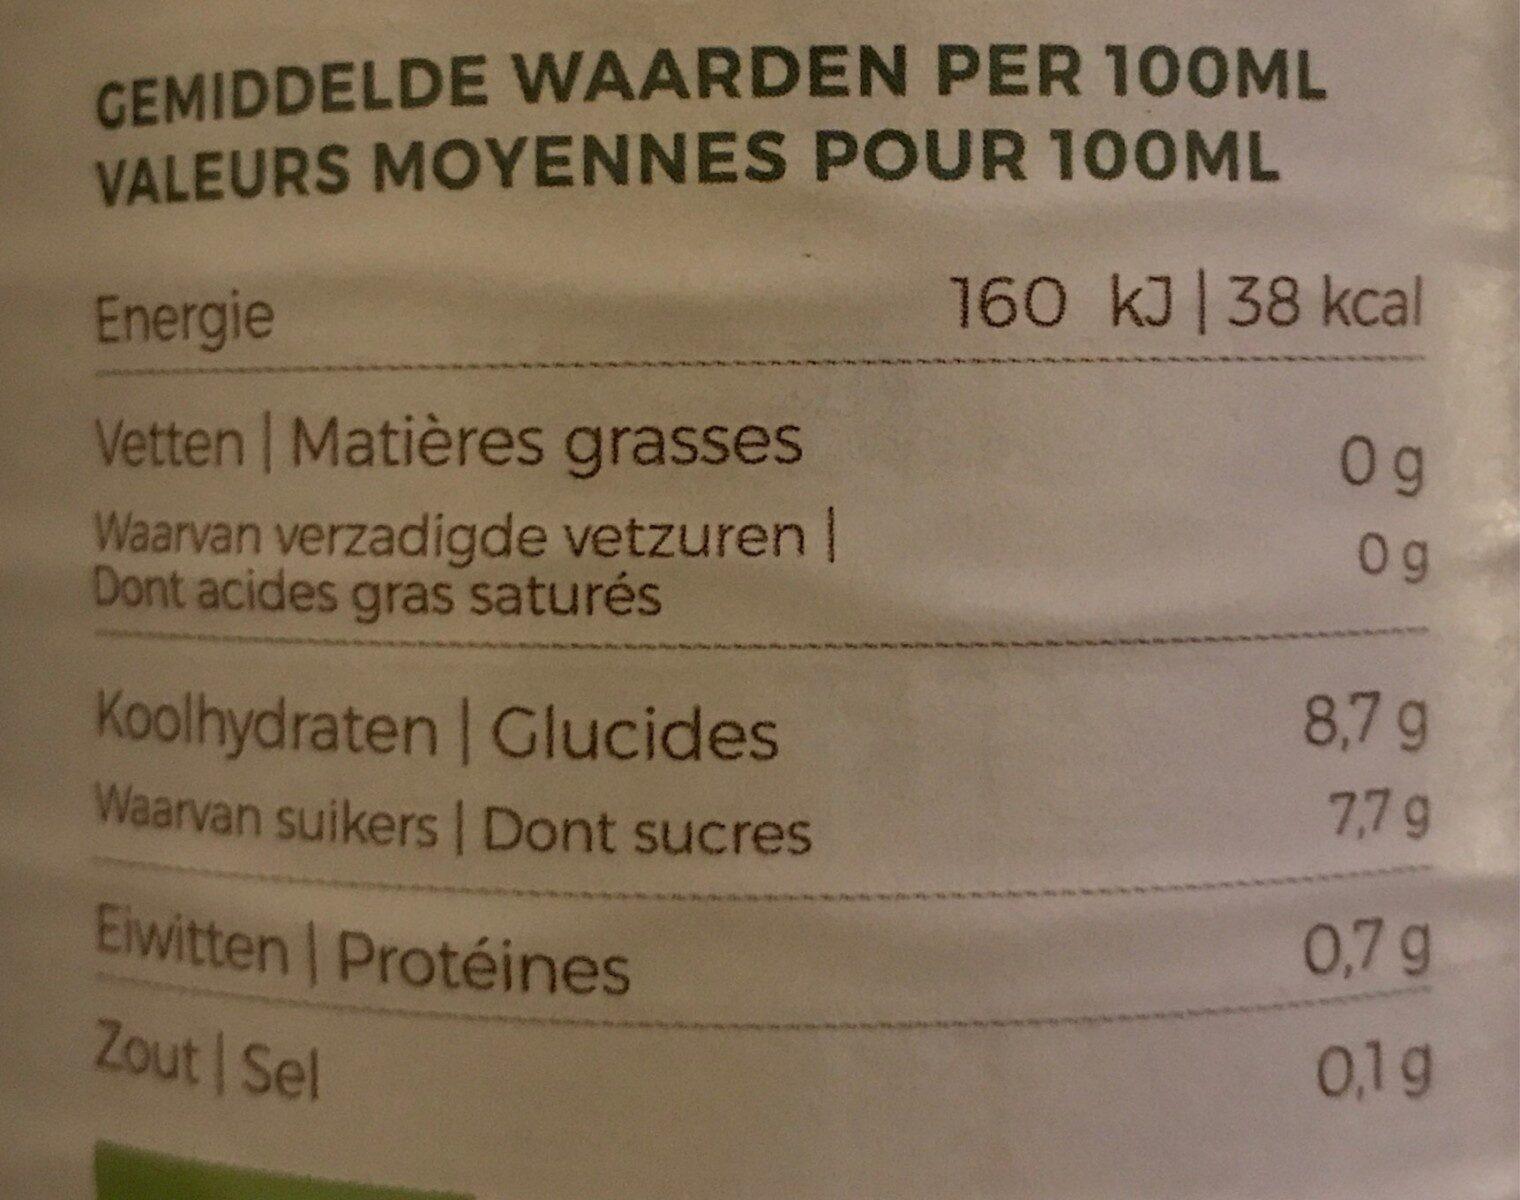 Mélange de jus de légumes - Voedingswaarden - fr